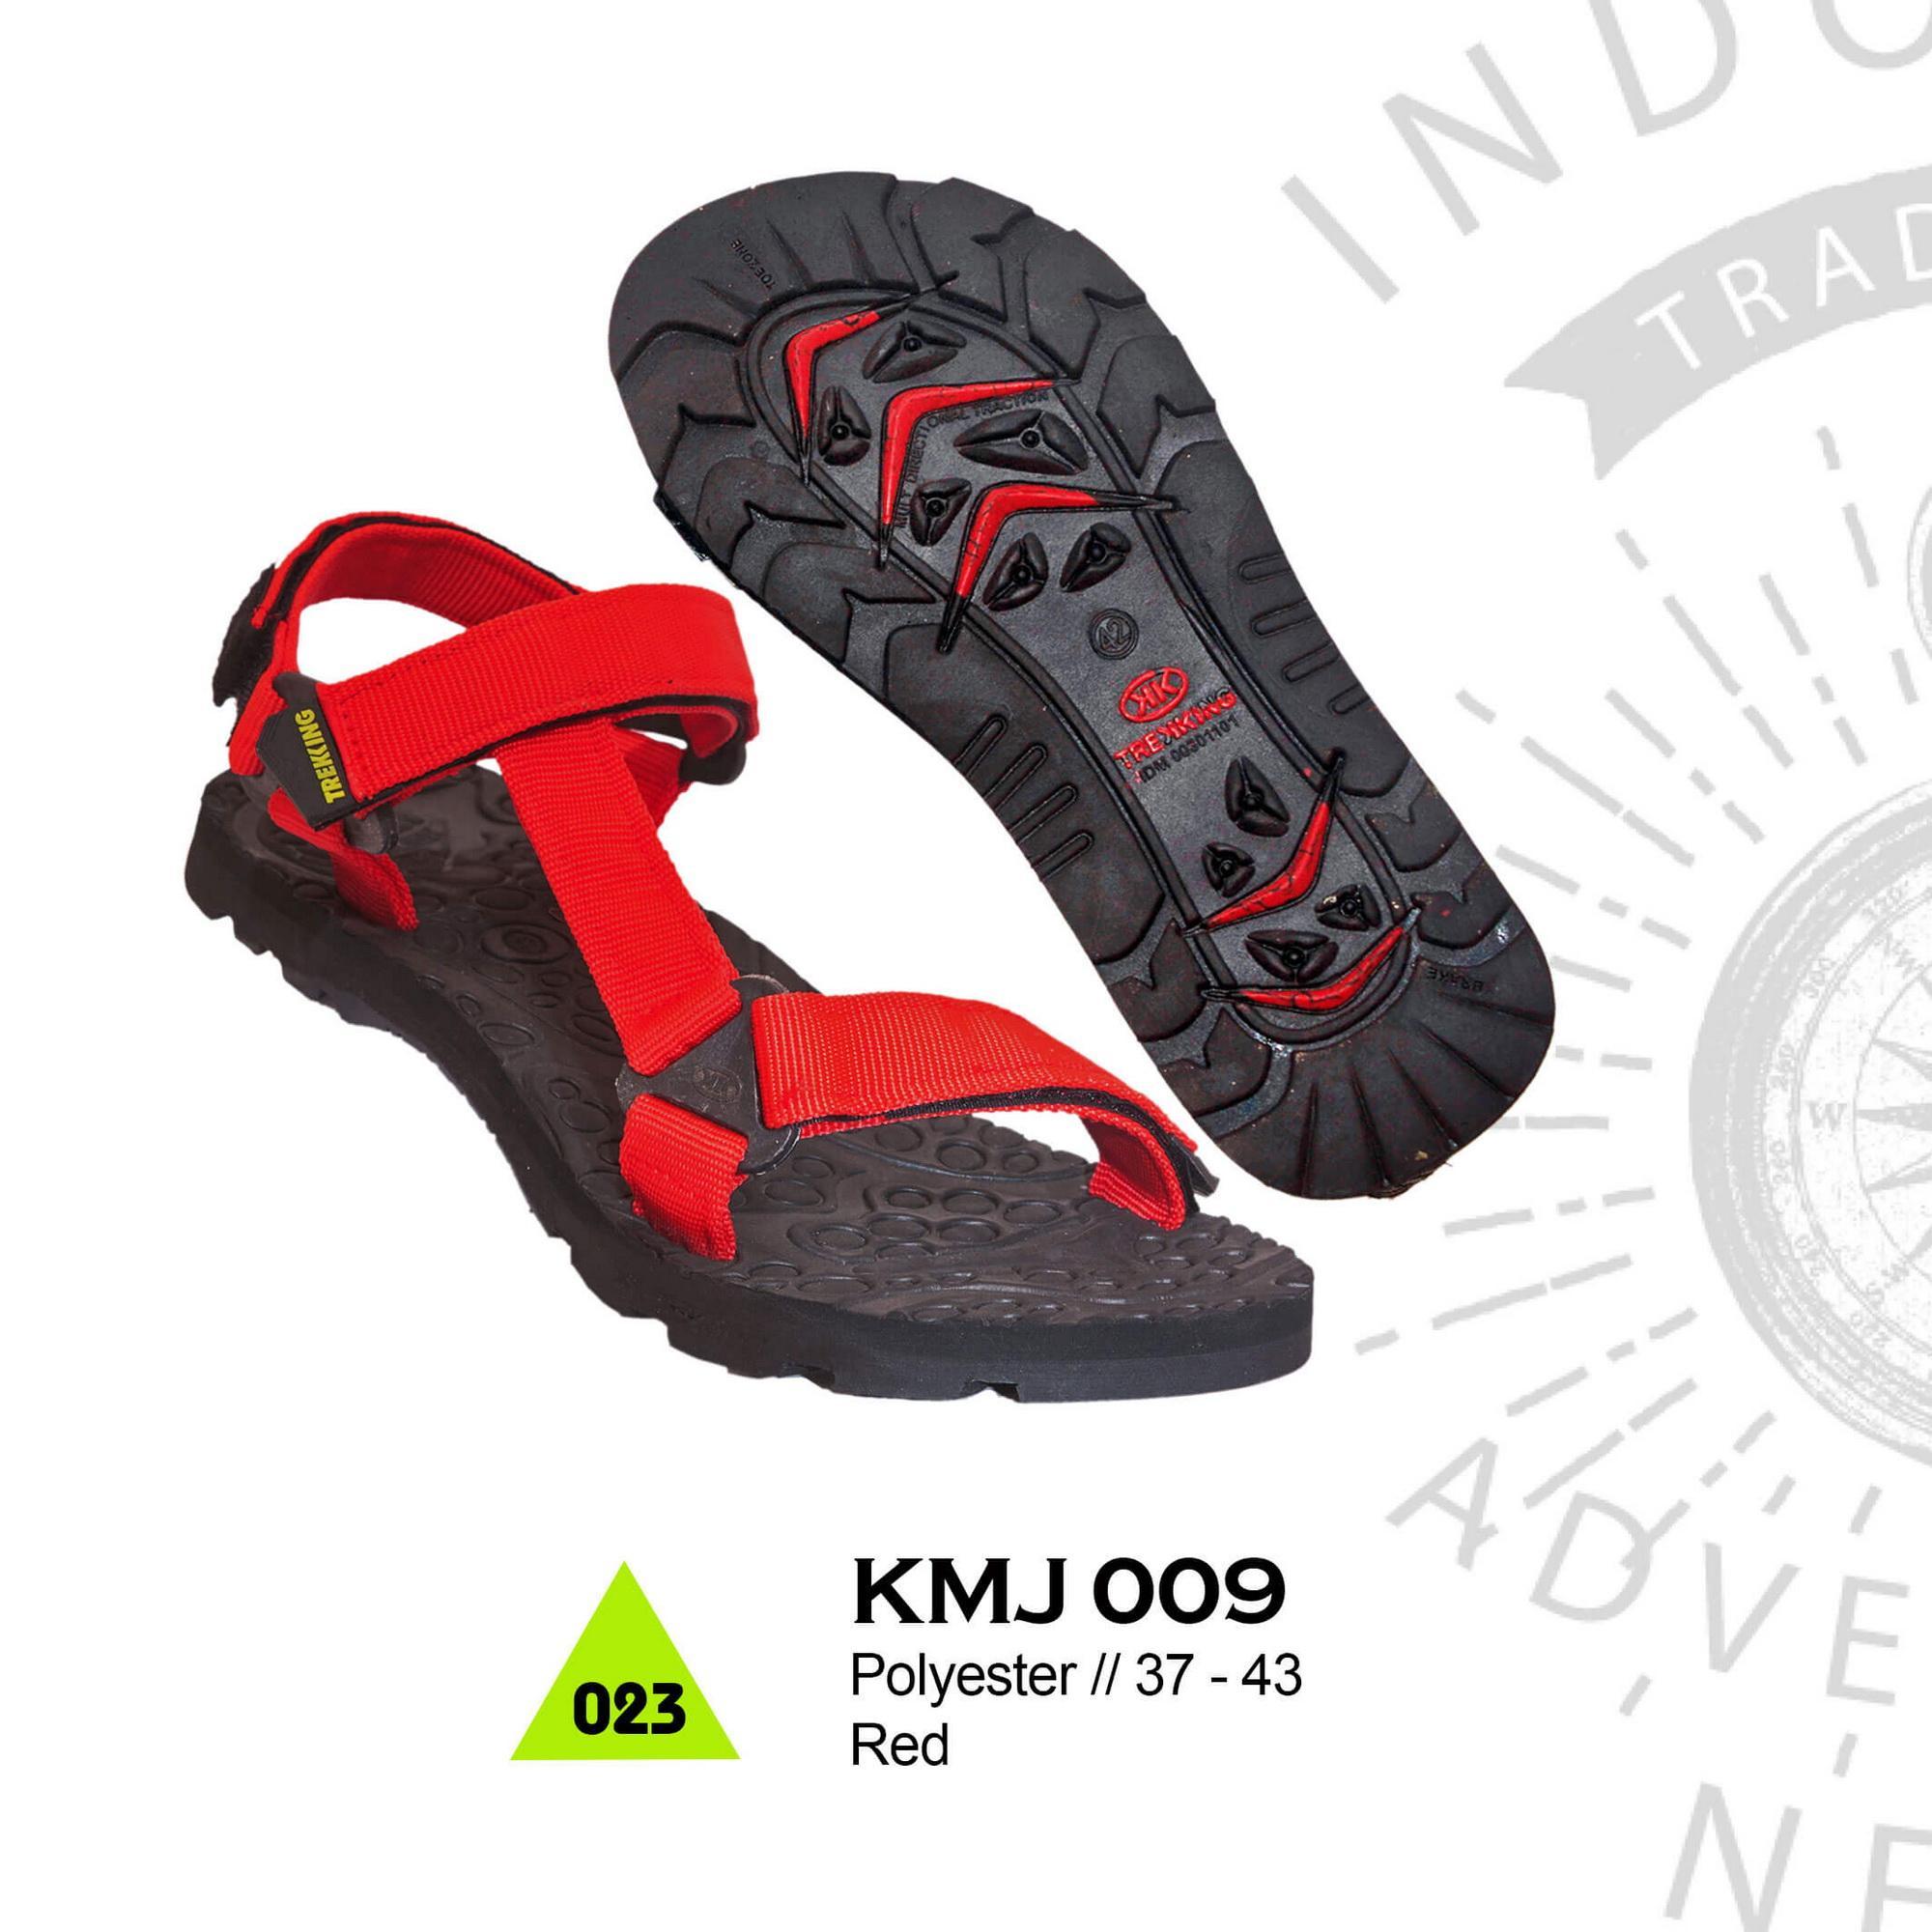 Trekking Sandal Gunung Hiking Adventure Pria & Wanita KMJ 009 Mai Aditama